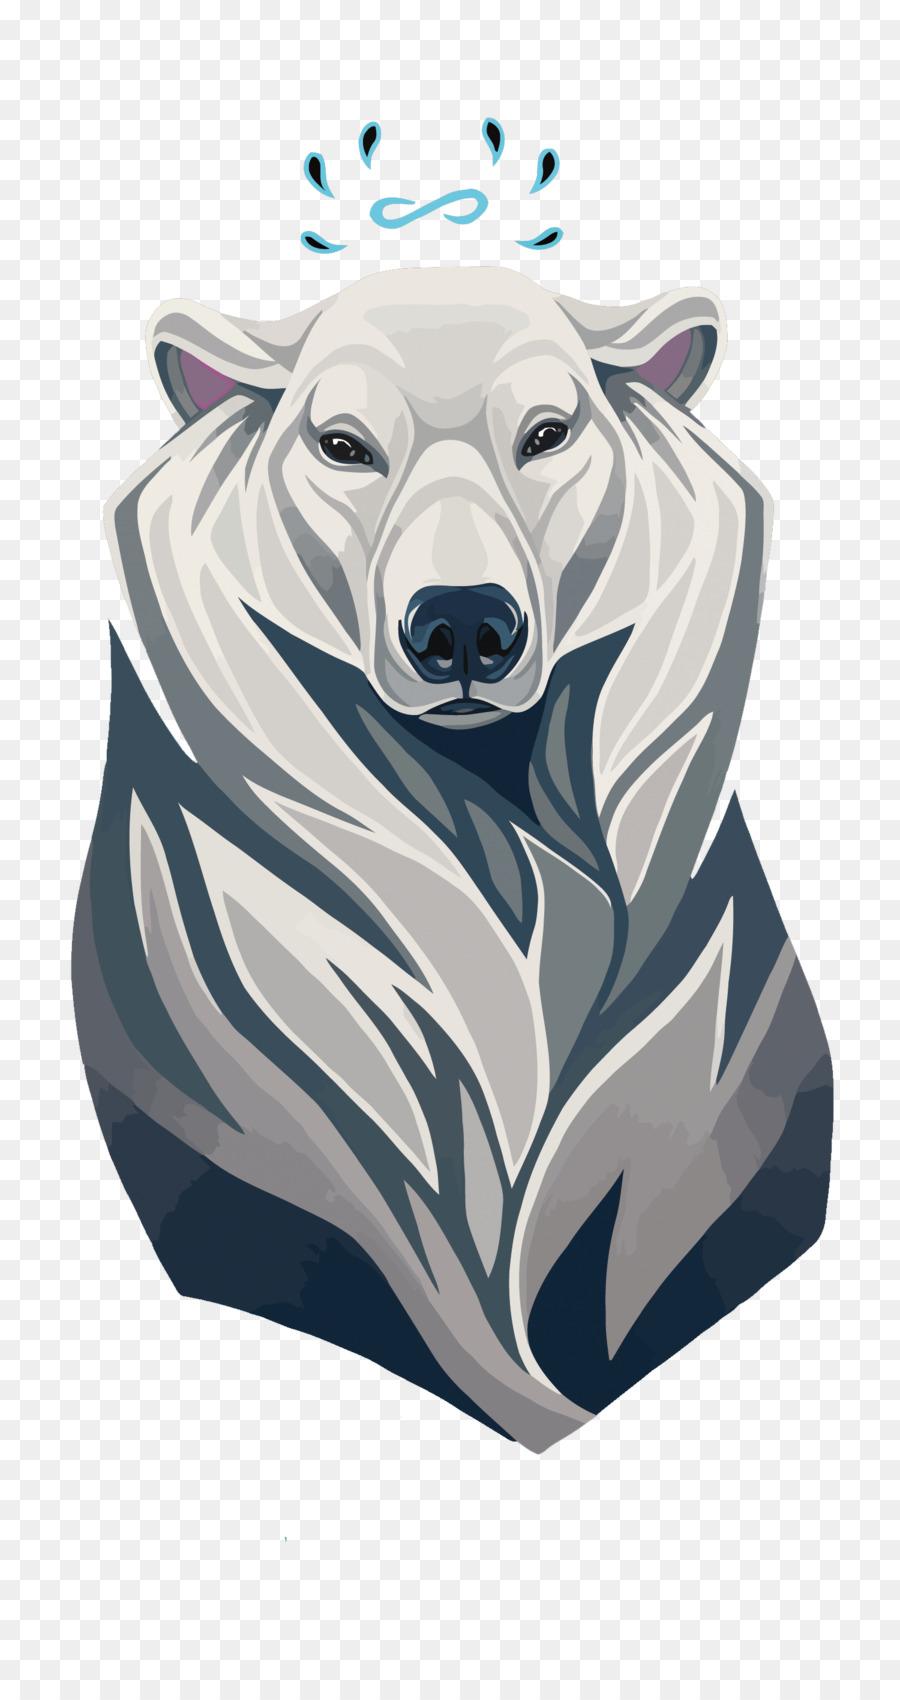 900x1700 Polar Bear